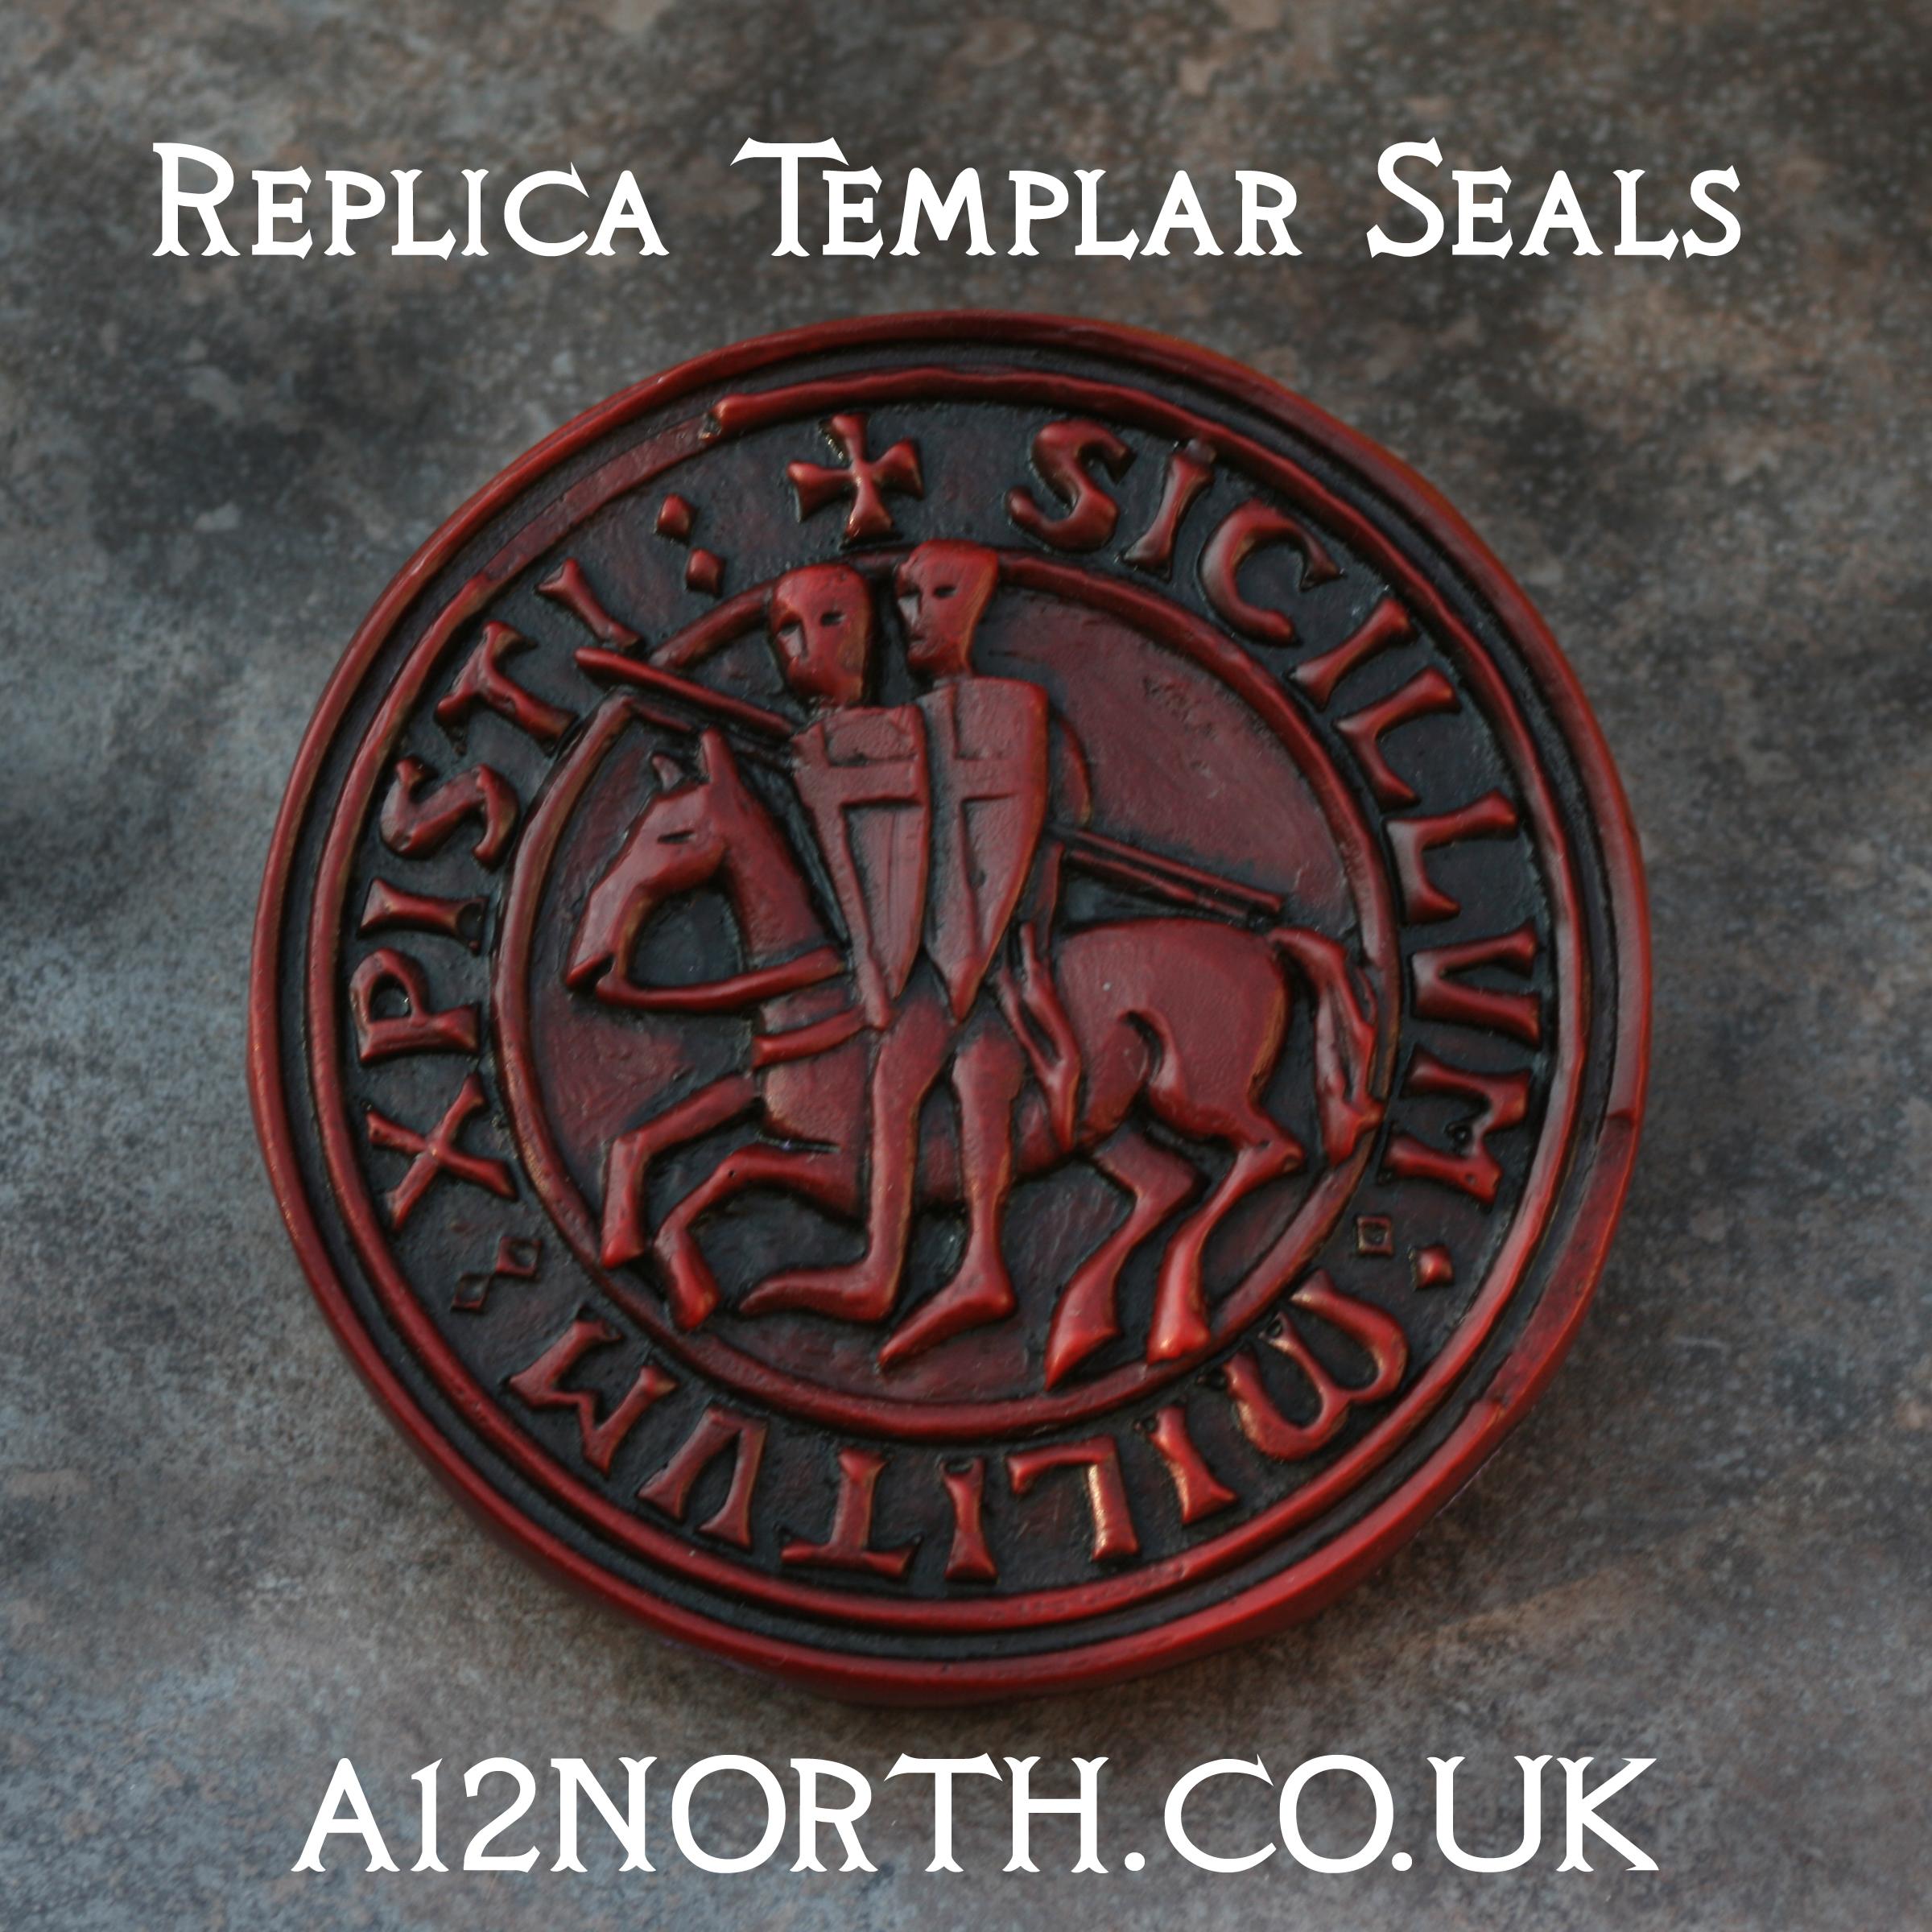 Templar Seals